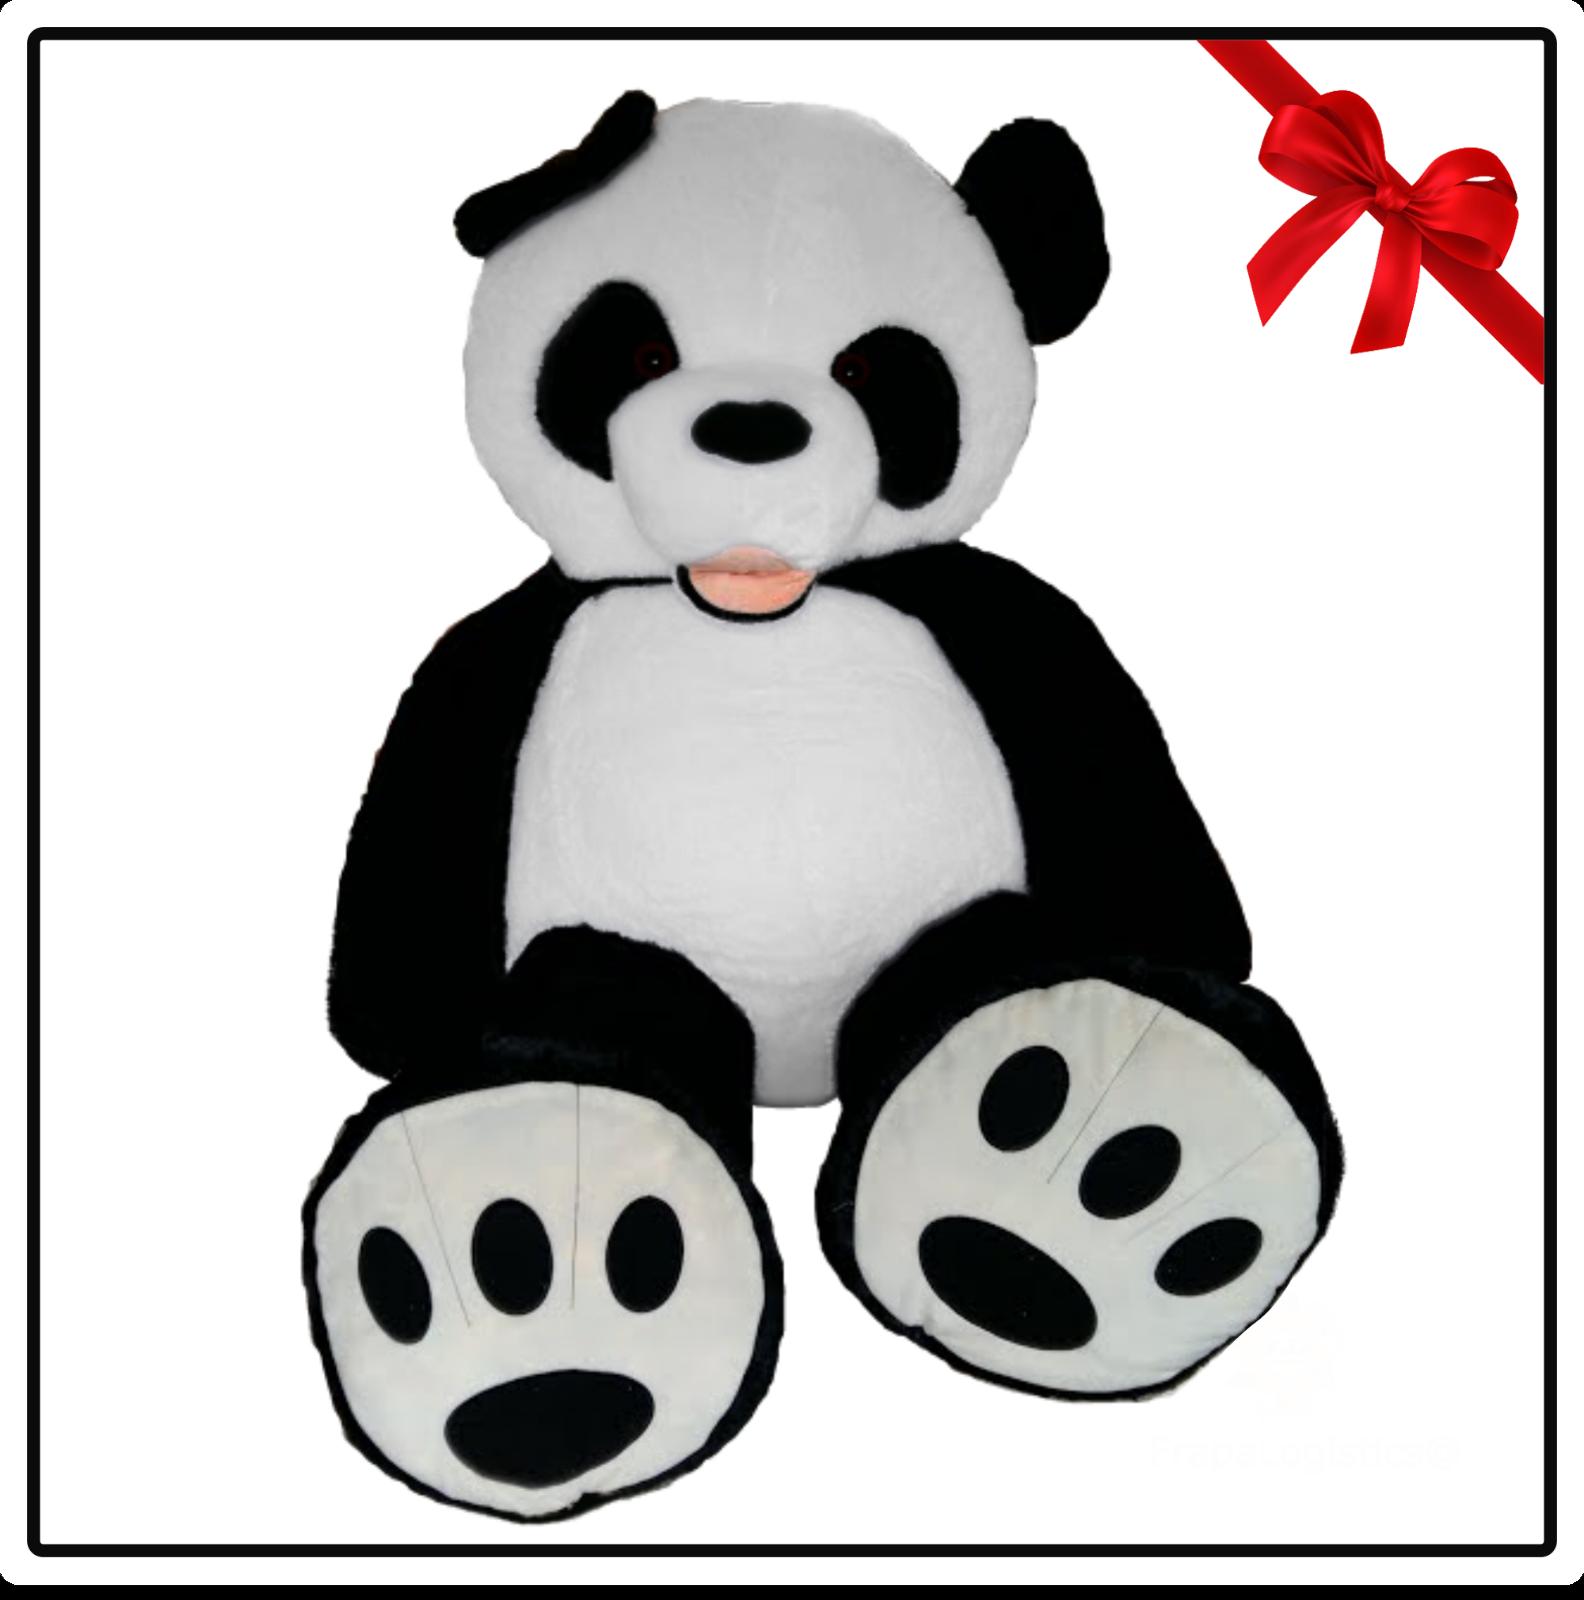 Peluche Panda Gigante 200cm Teddy Bear Orso Plush Grande Grande Grande XXLRegalo San Valentino 9de0b5